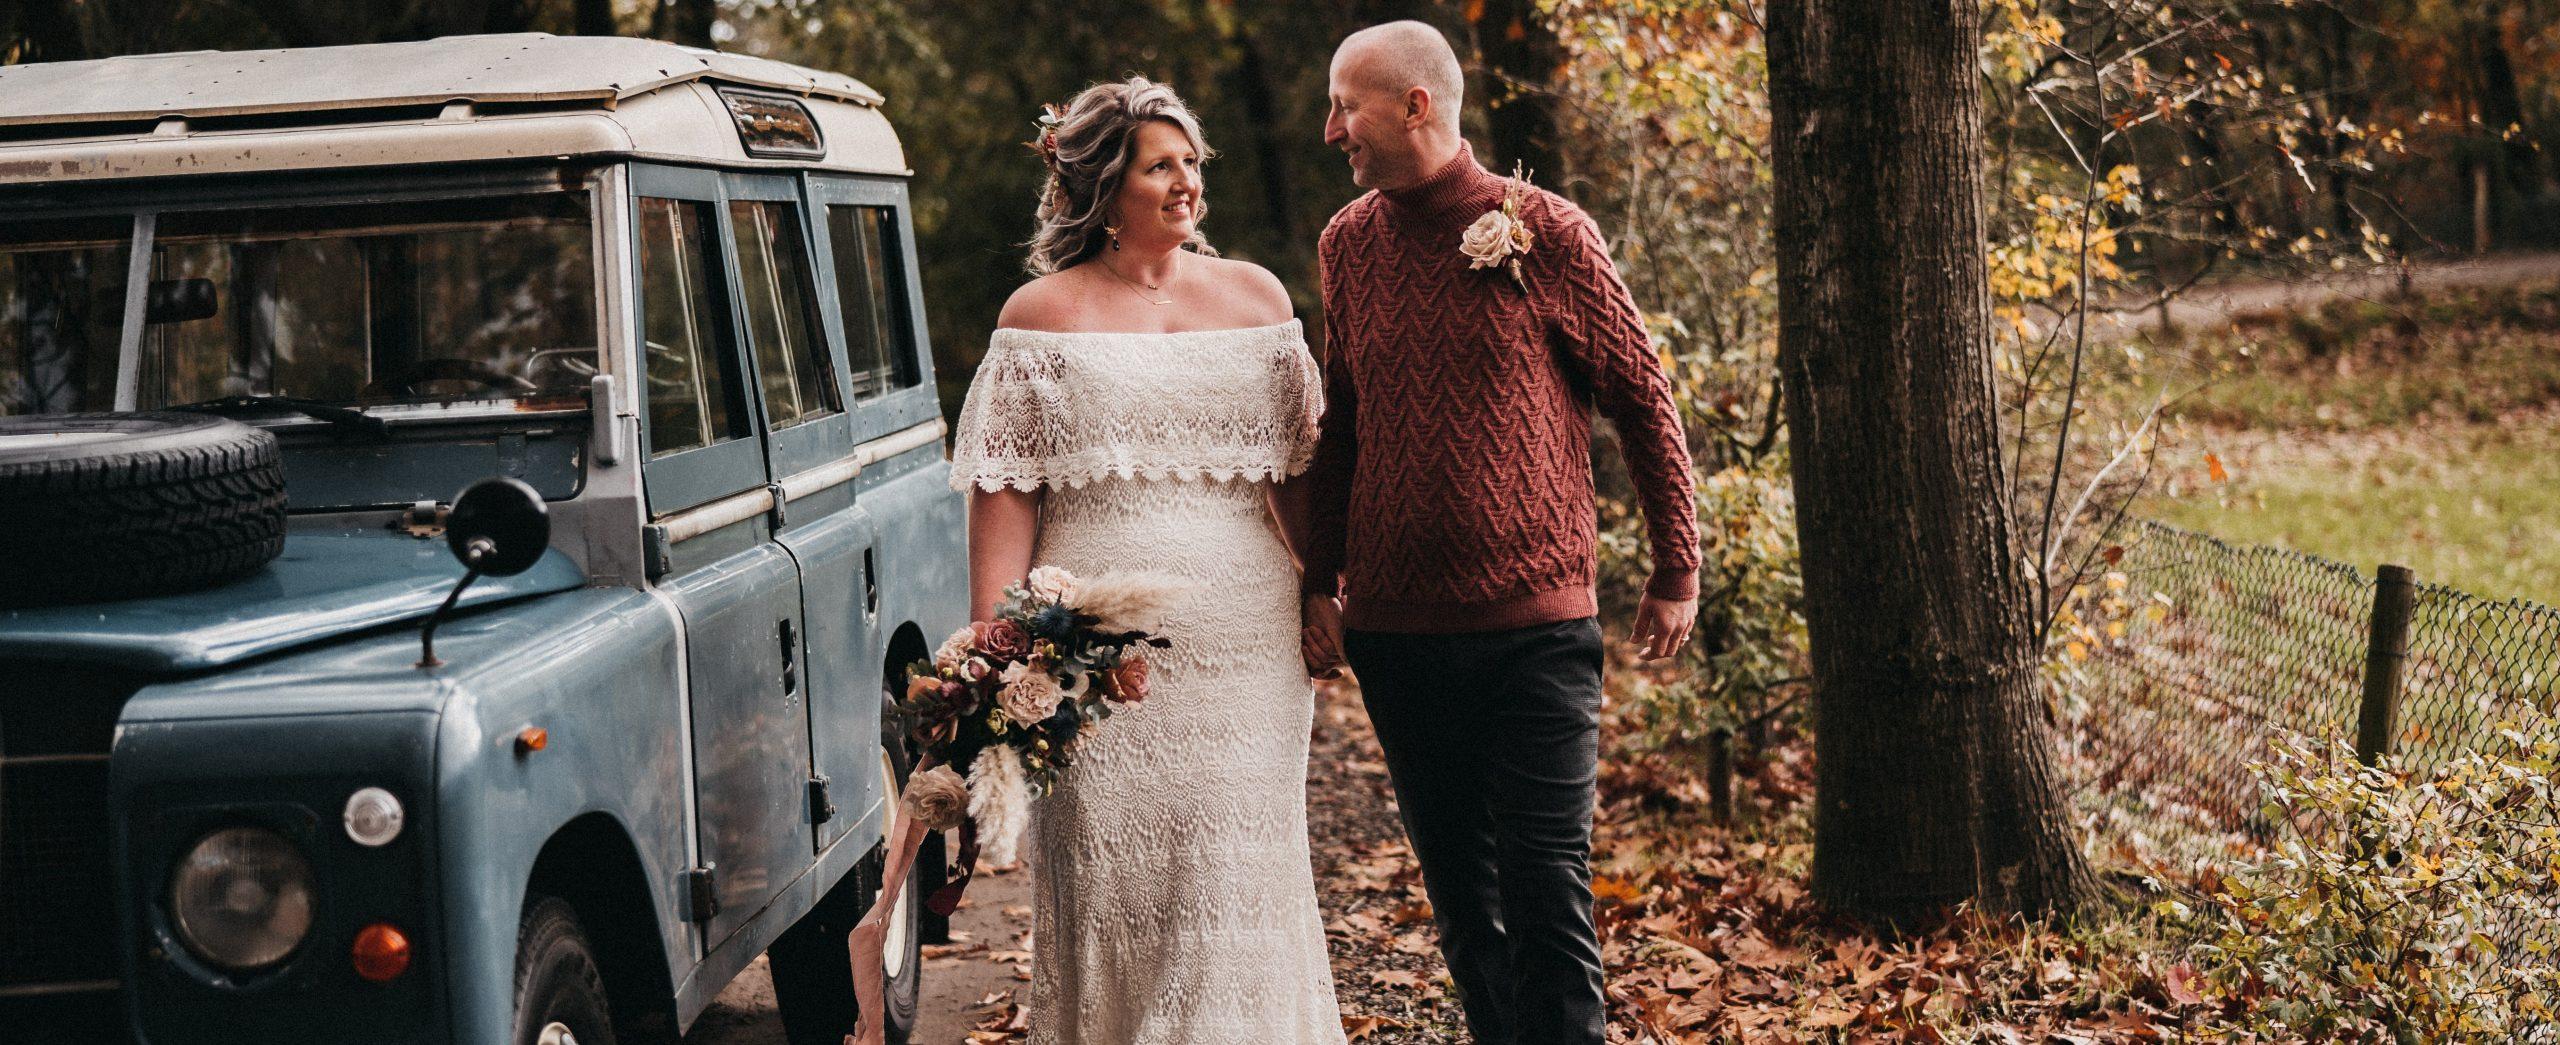 Bruiloft Thema Narnia: Deze styled shoot wil je zien!